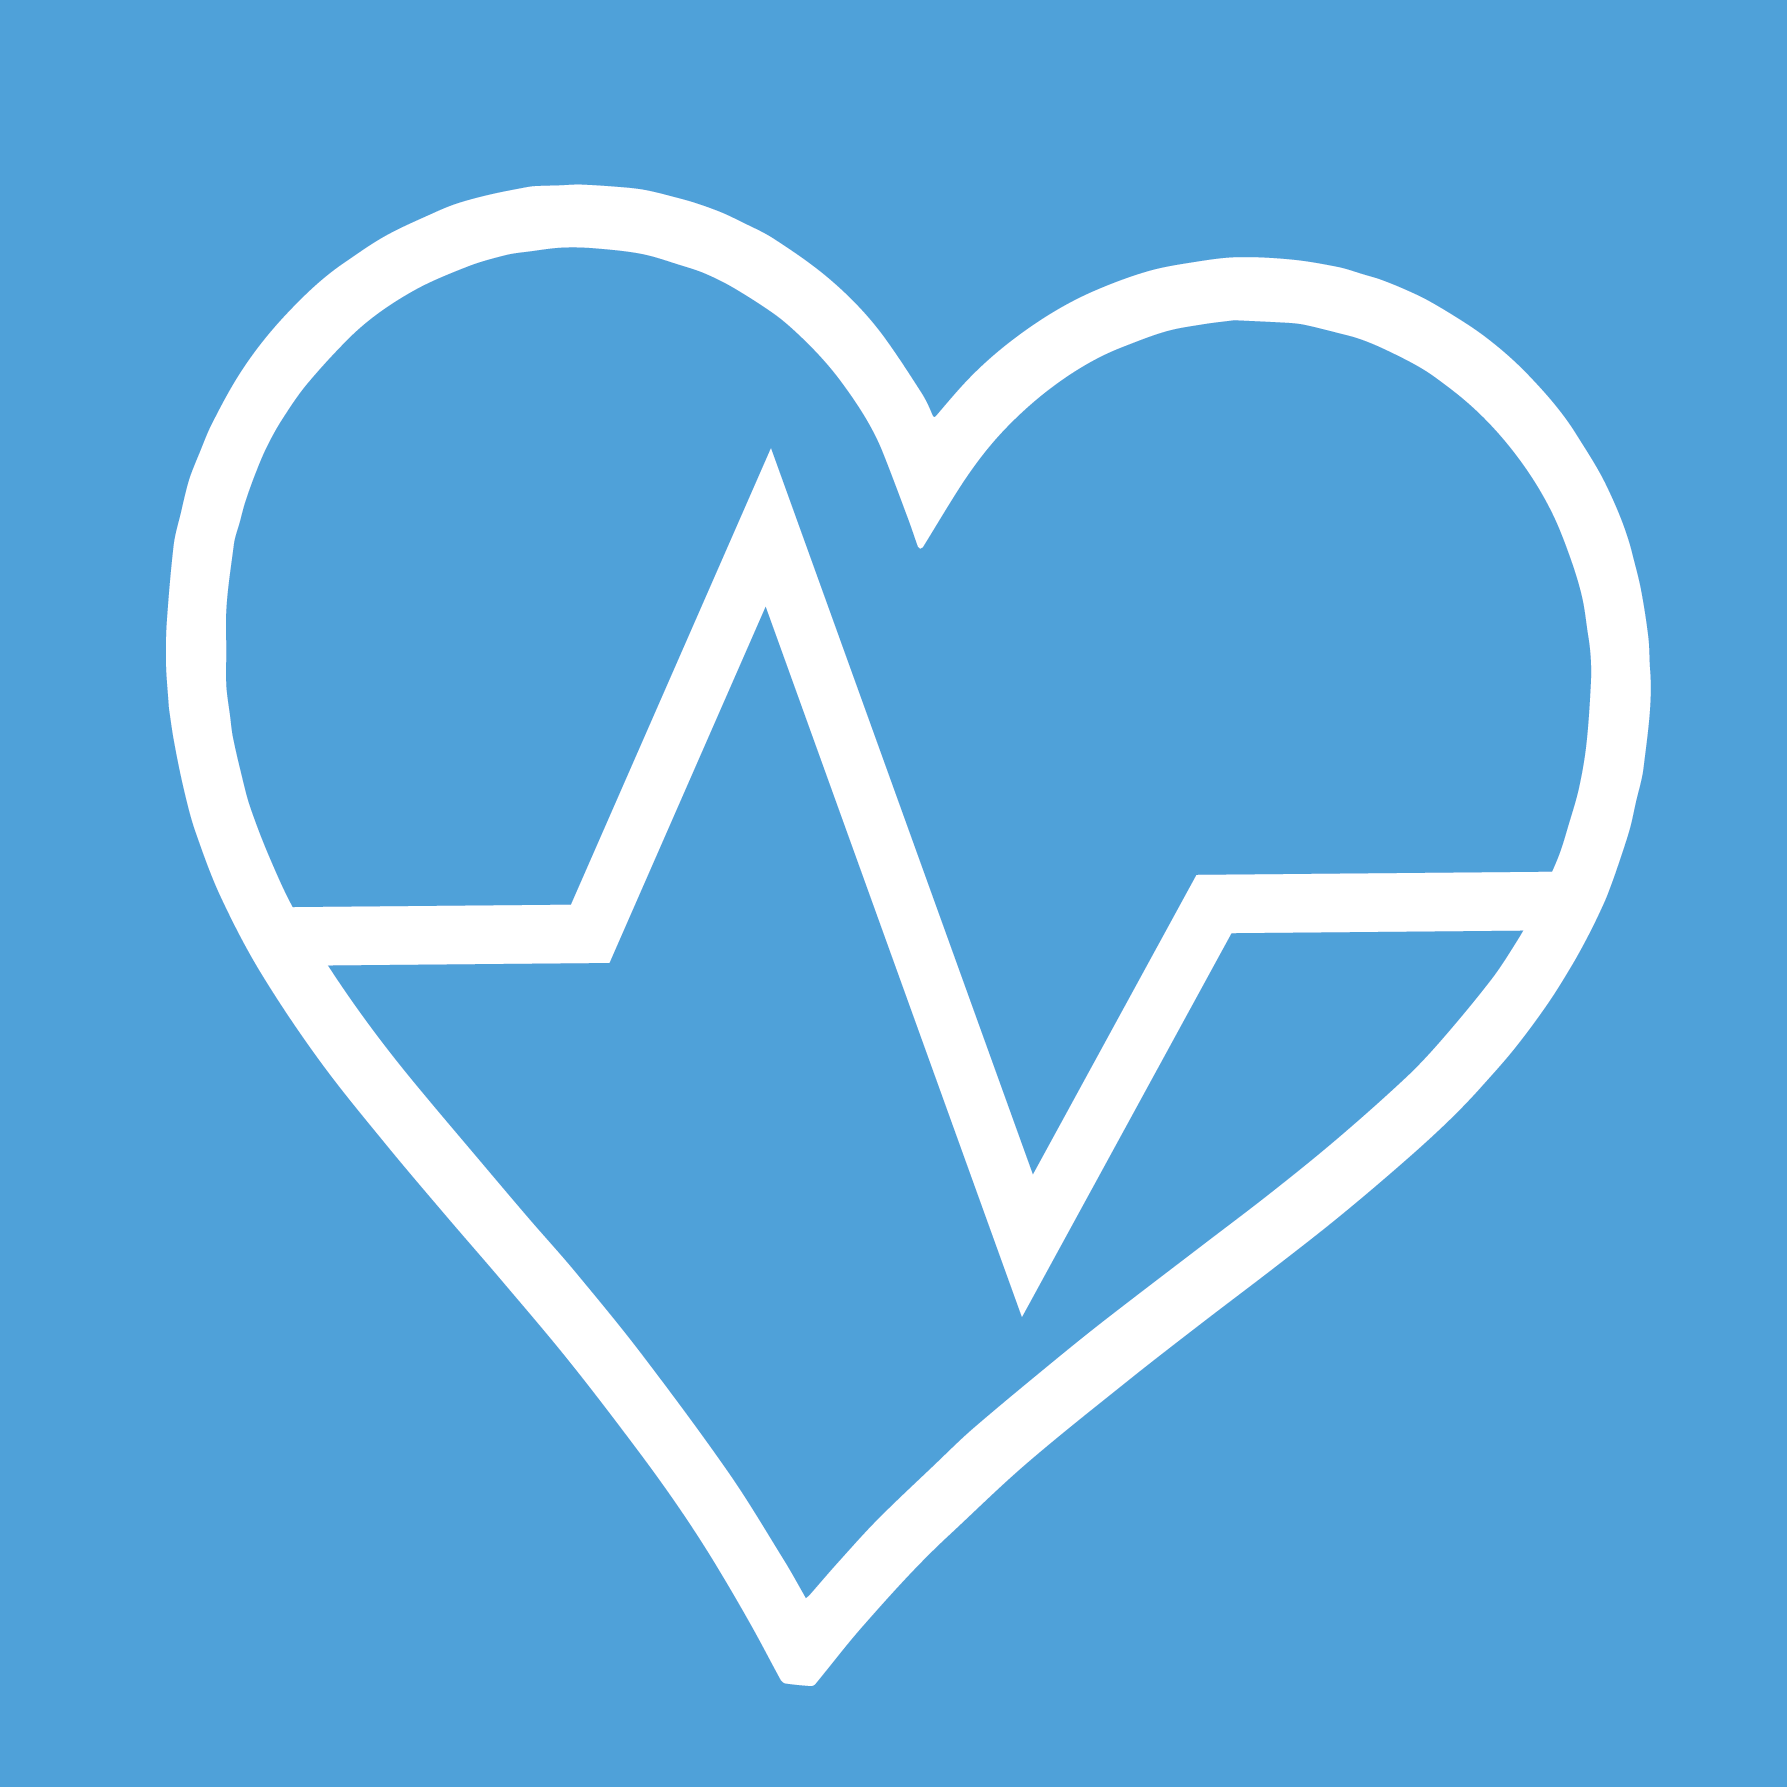 Ideal Health Services - Las Vegas, NV 89169 - (702)916-1500 | ShowMeLocal.com